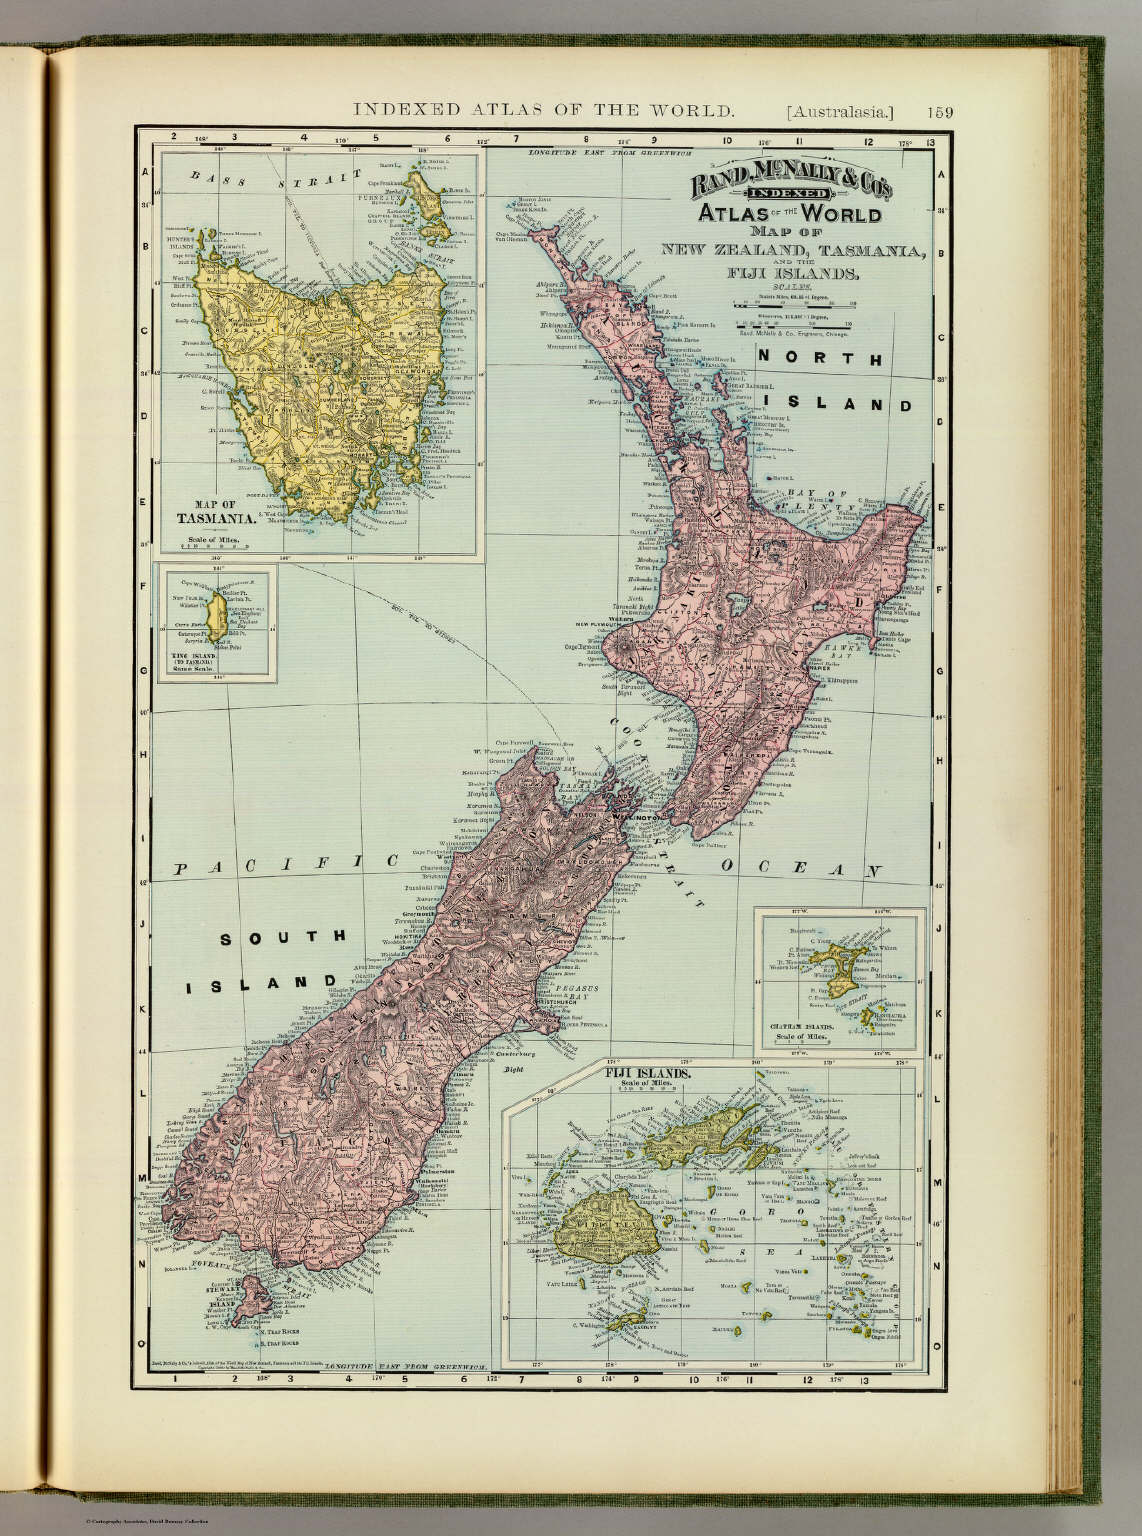 New zealand tasmania fiji david rumsey historical map collection new zealand tasmania fiji gumiabroncs Choice Image